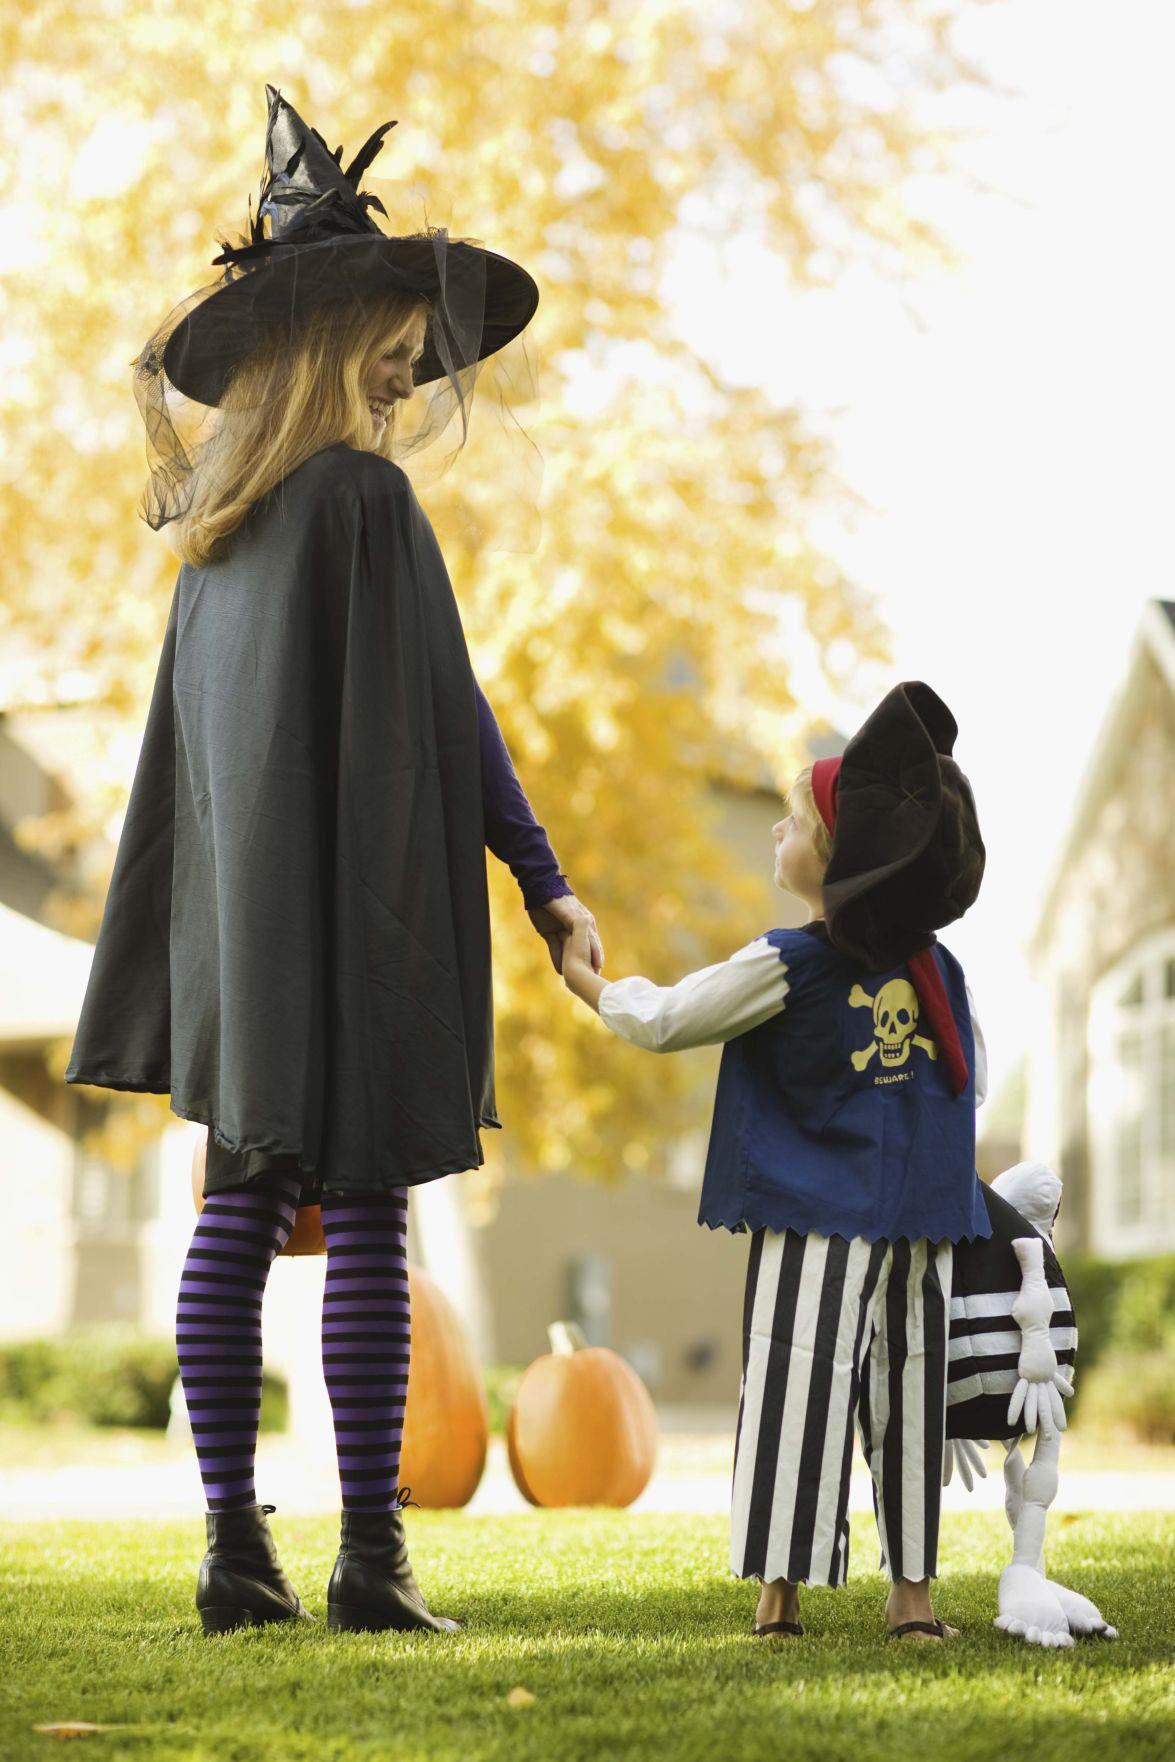 HalloweenSafety.jpg